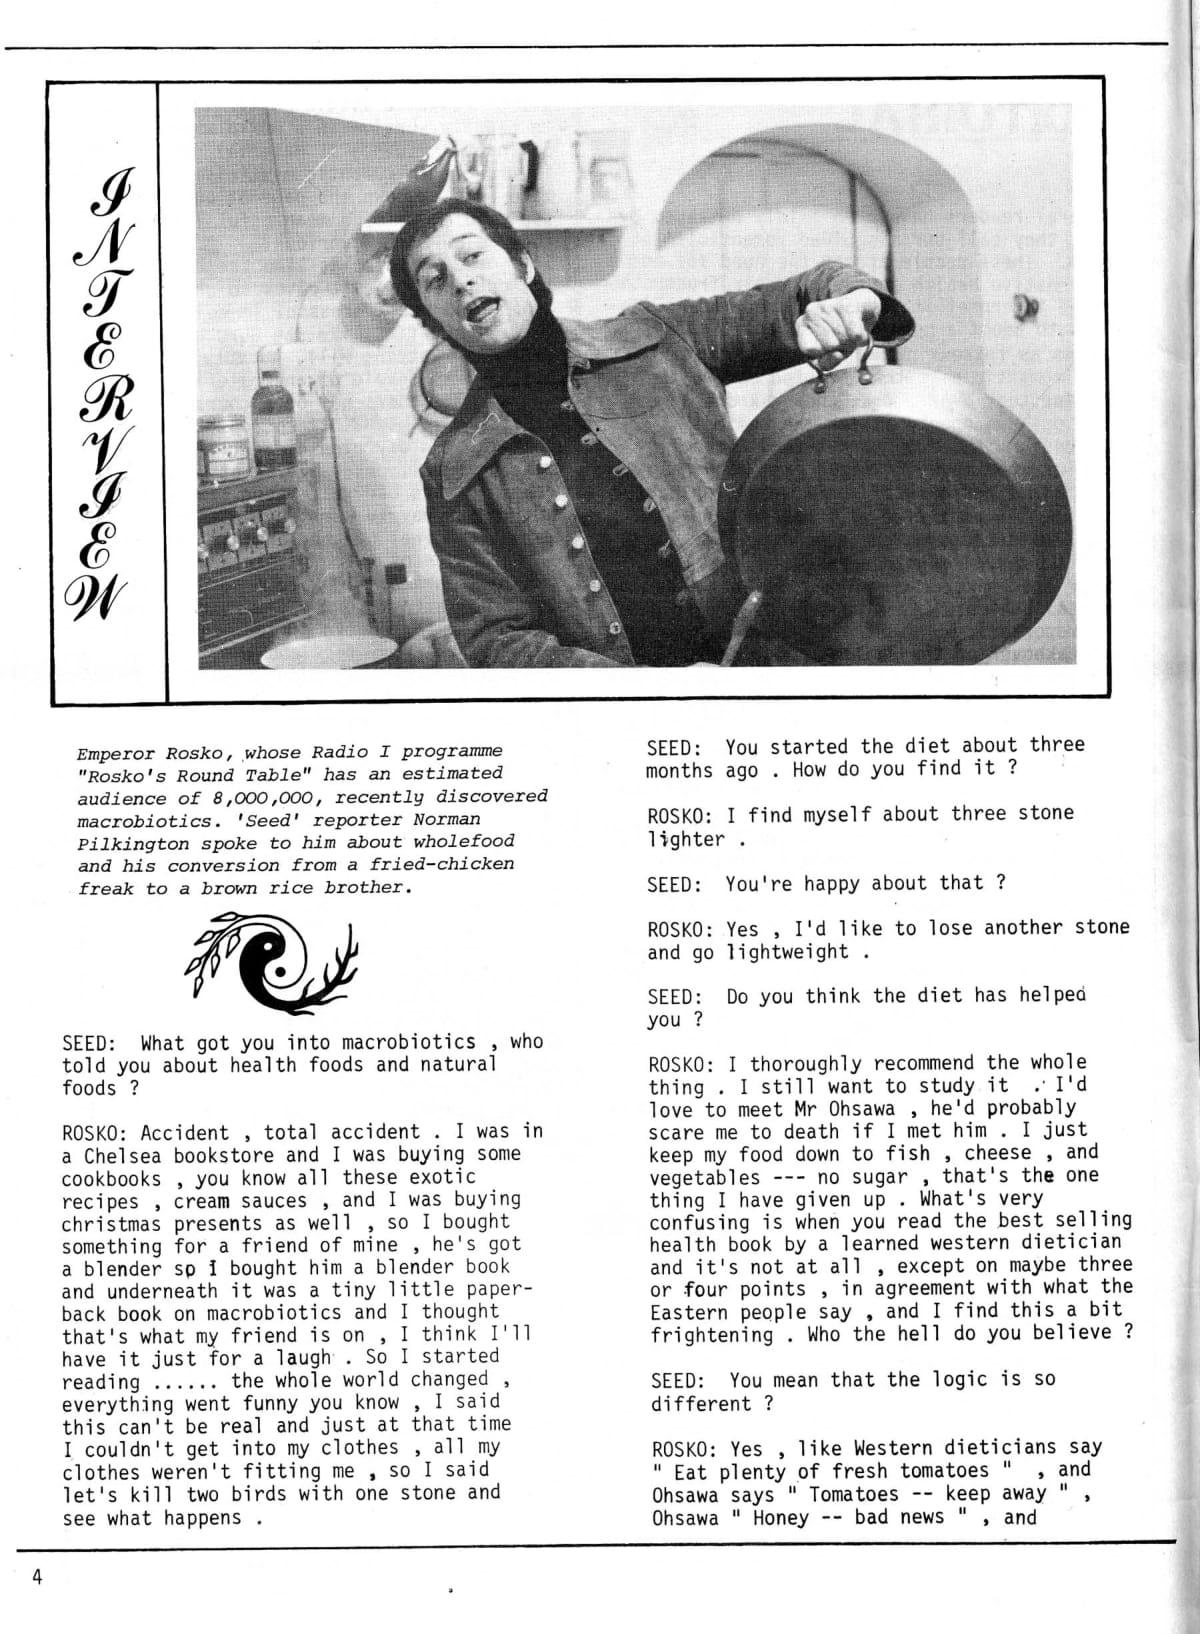 seed-v2-n5-may1973-04.jpg